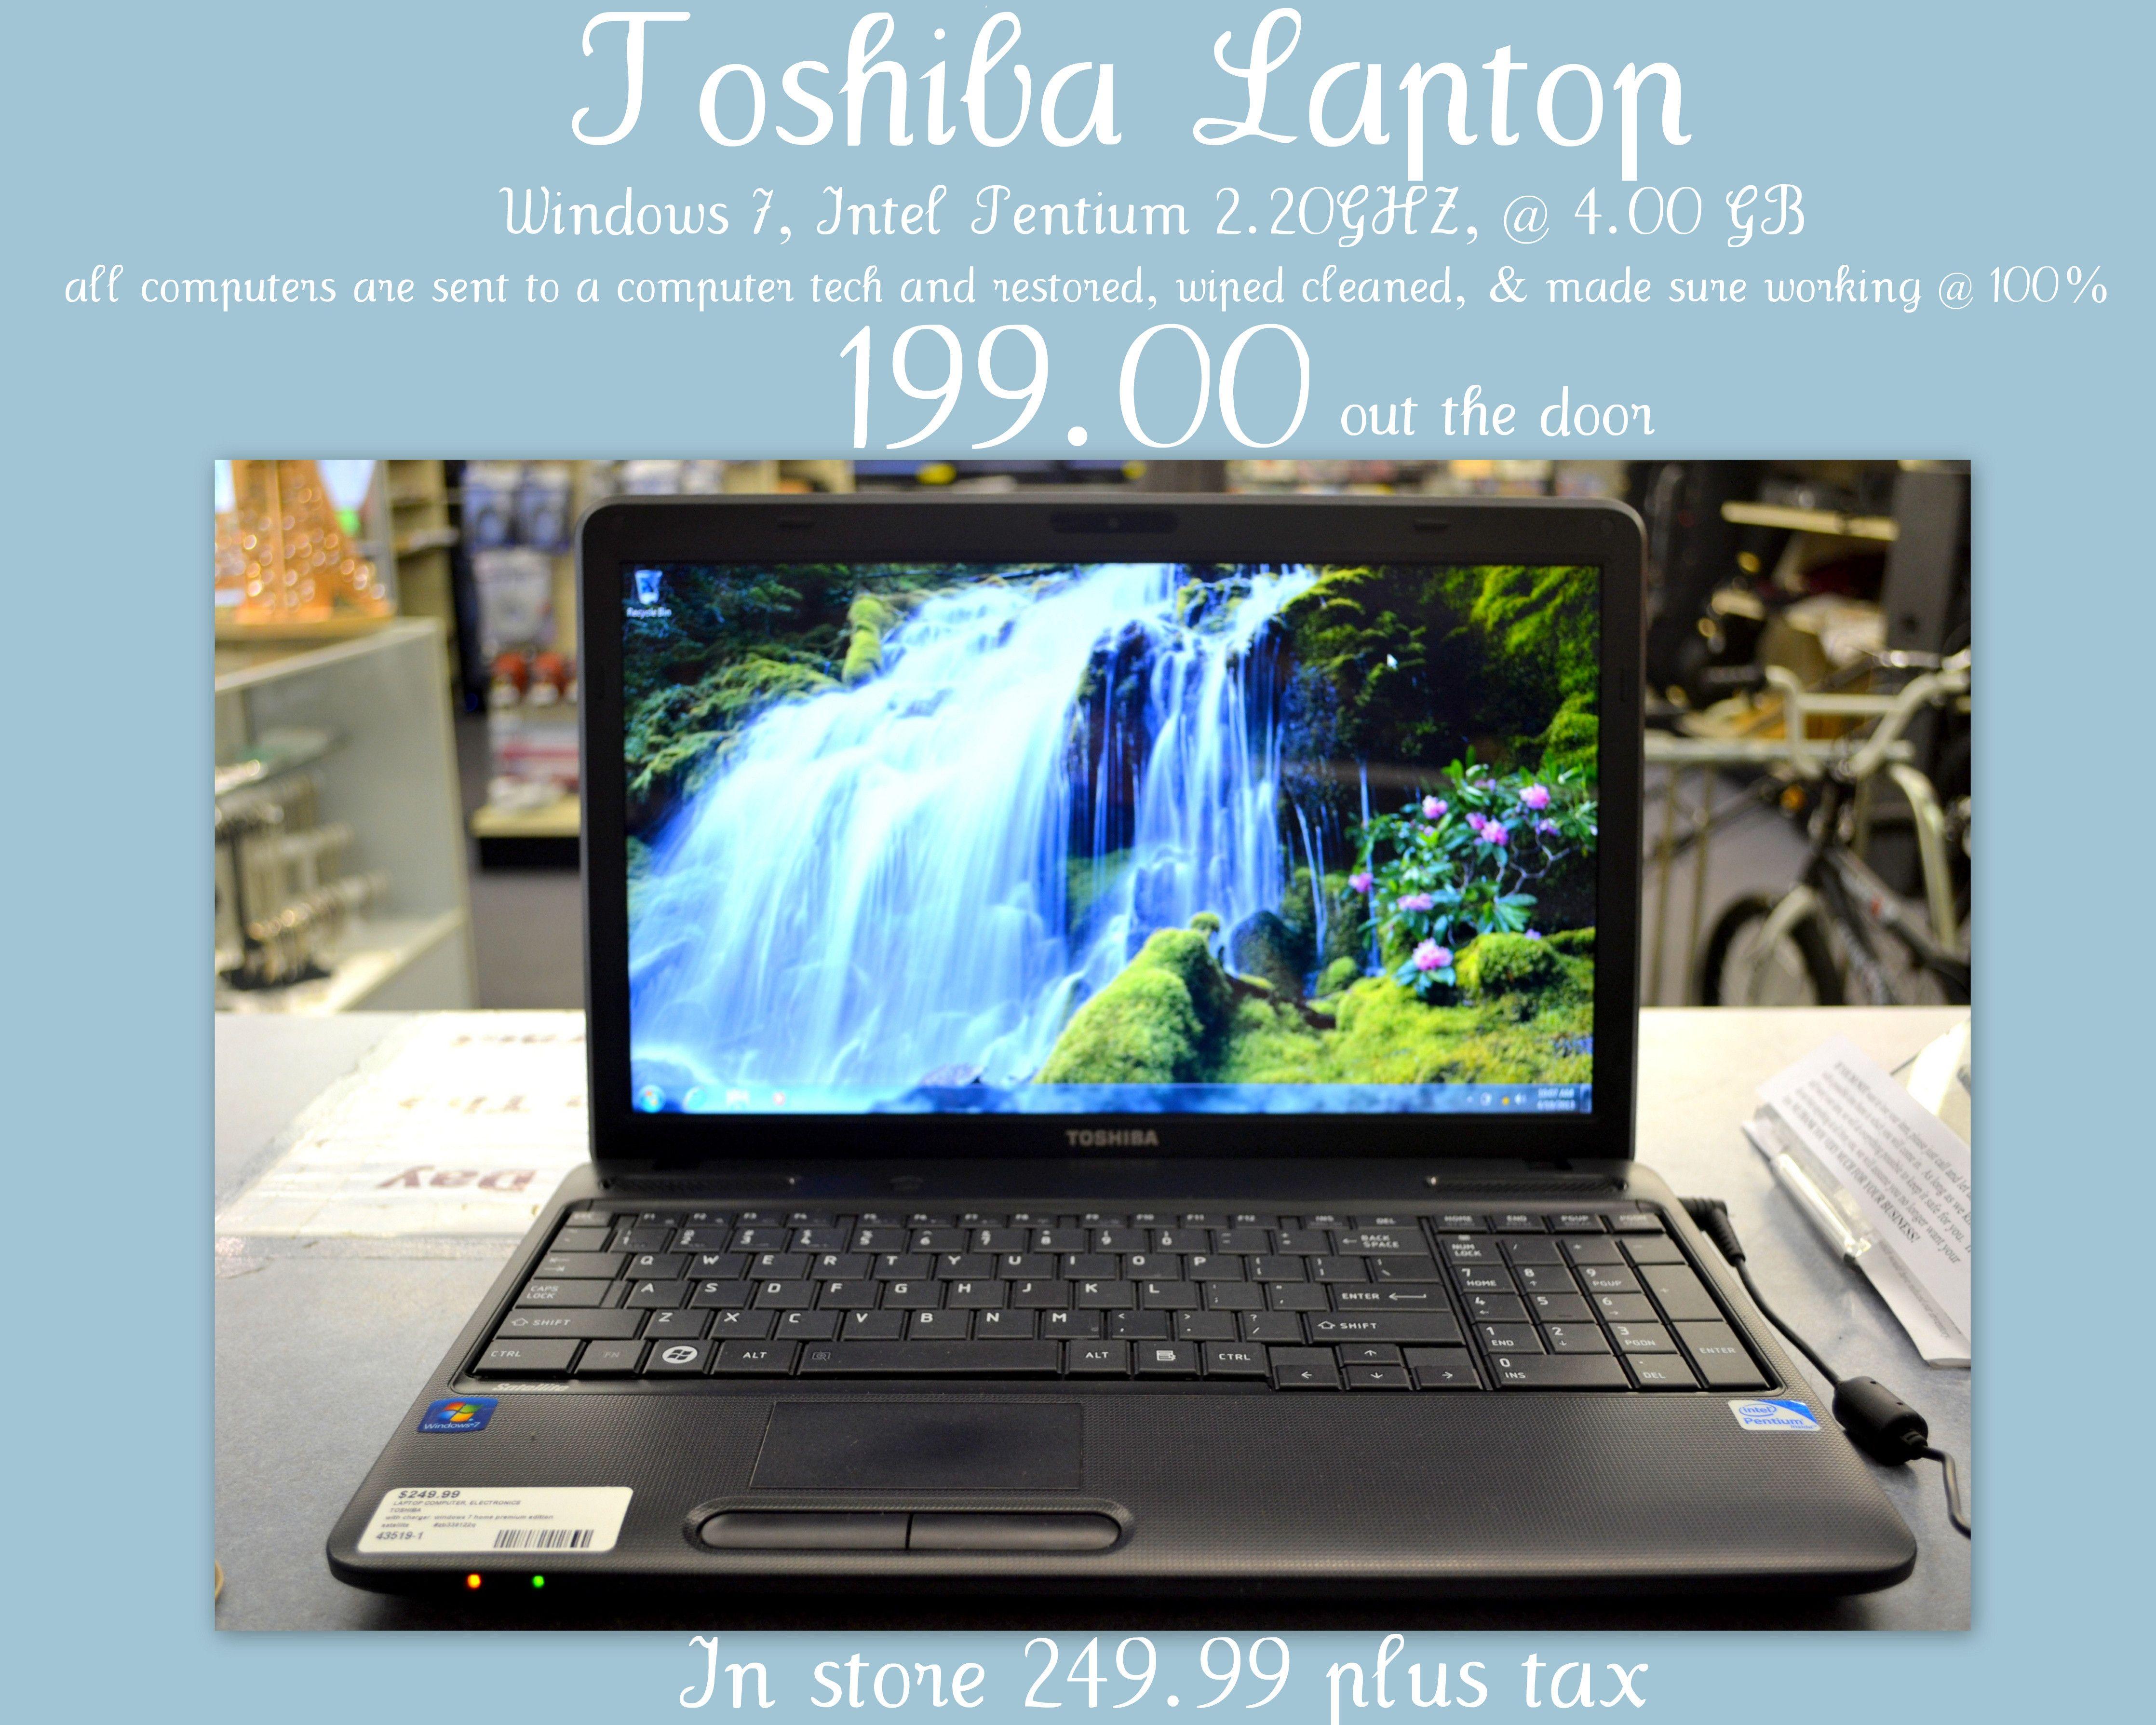 ded4cbaffb5d105a3a5fa85dc1d4c00b - Web Camera Application Windows 7 Toshiba